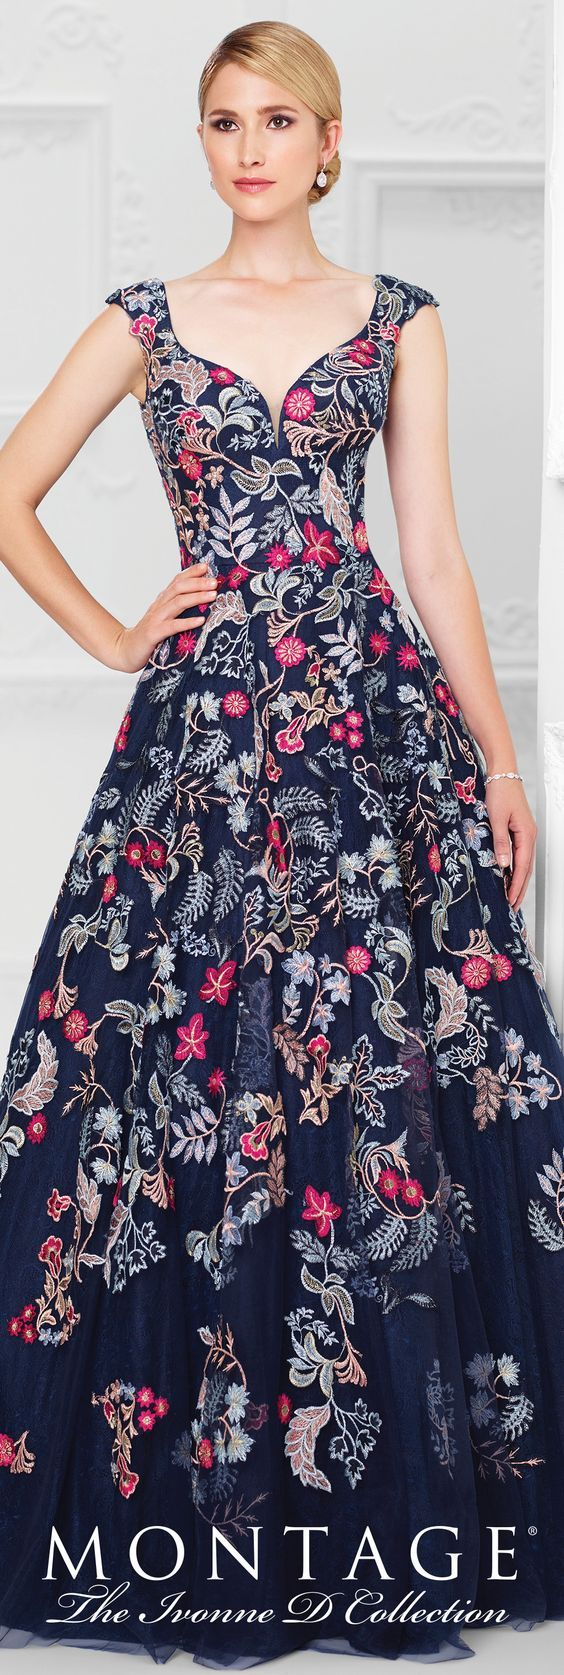 Ivonne D - Evening Dresses - 117D76   Vestiditos, Vestidos de fiesta ...